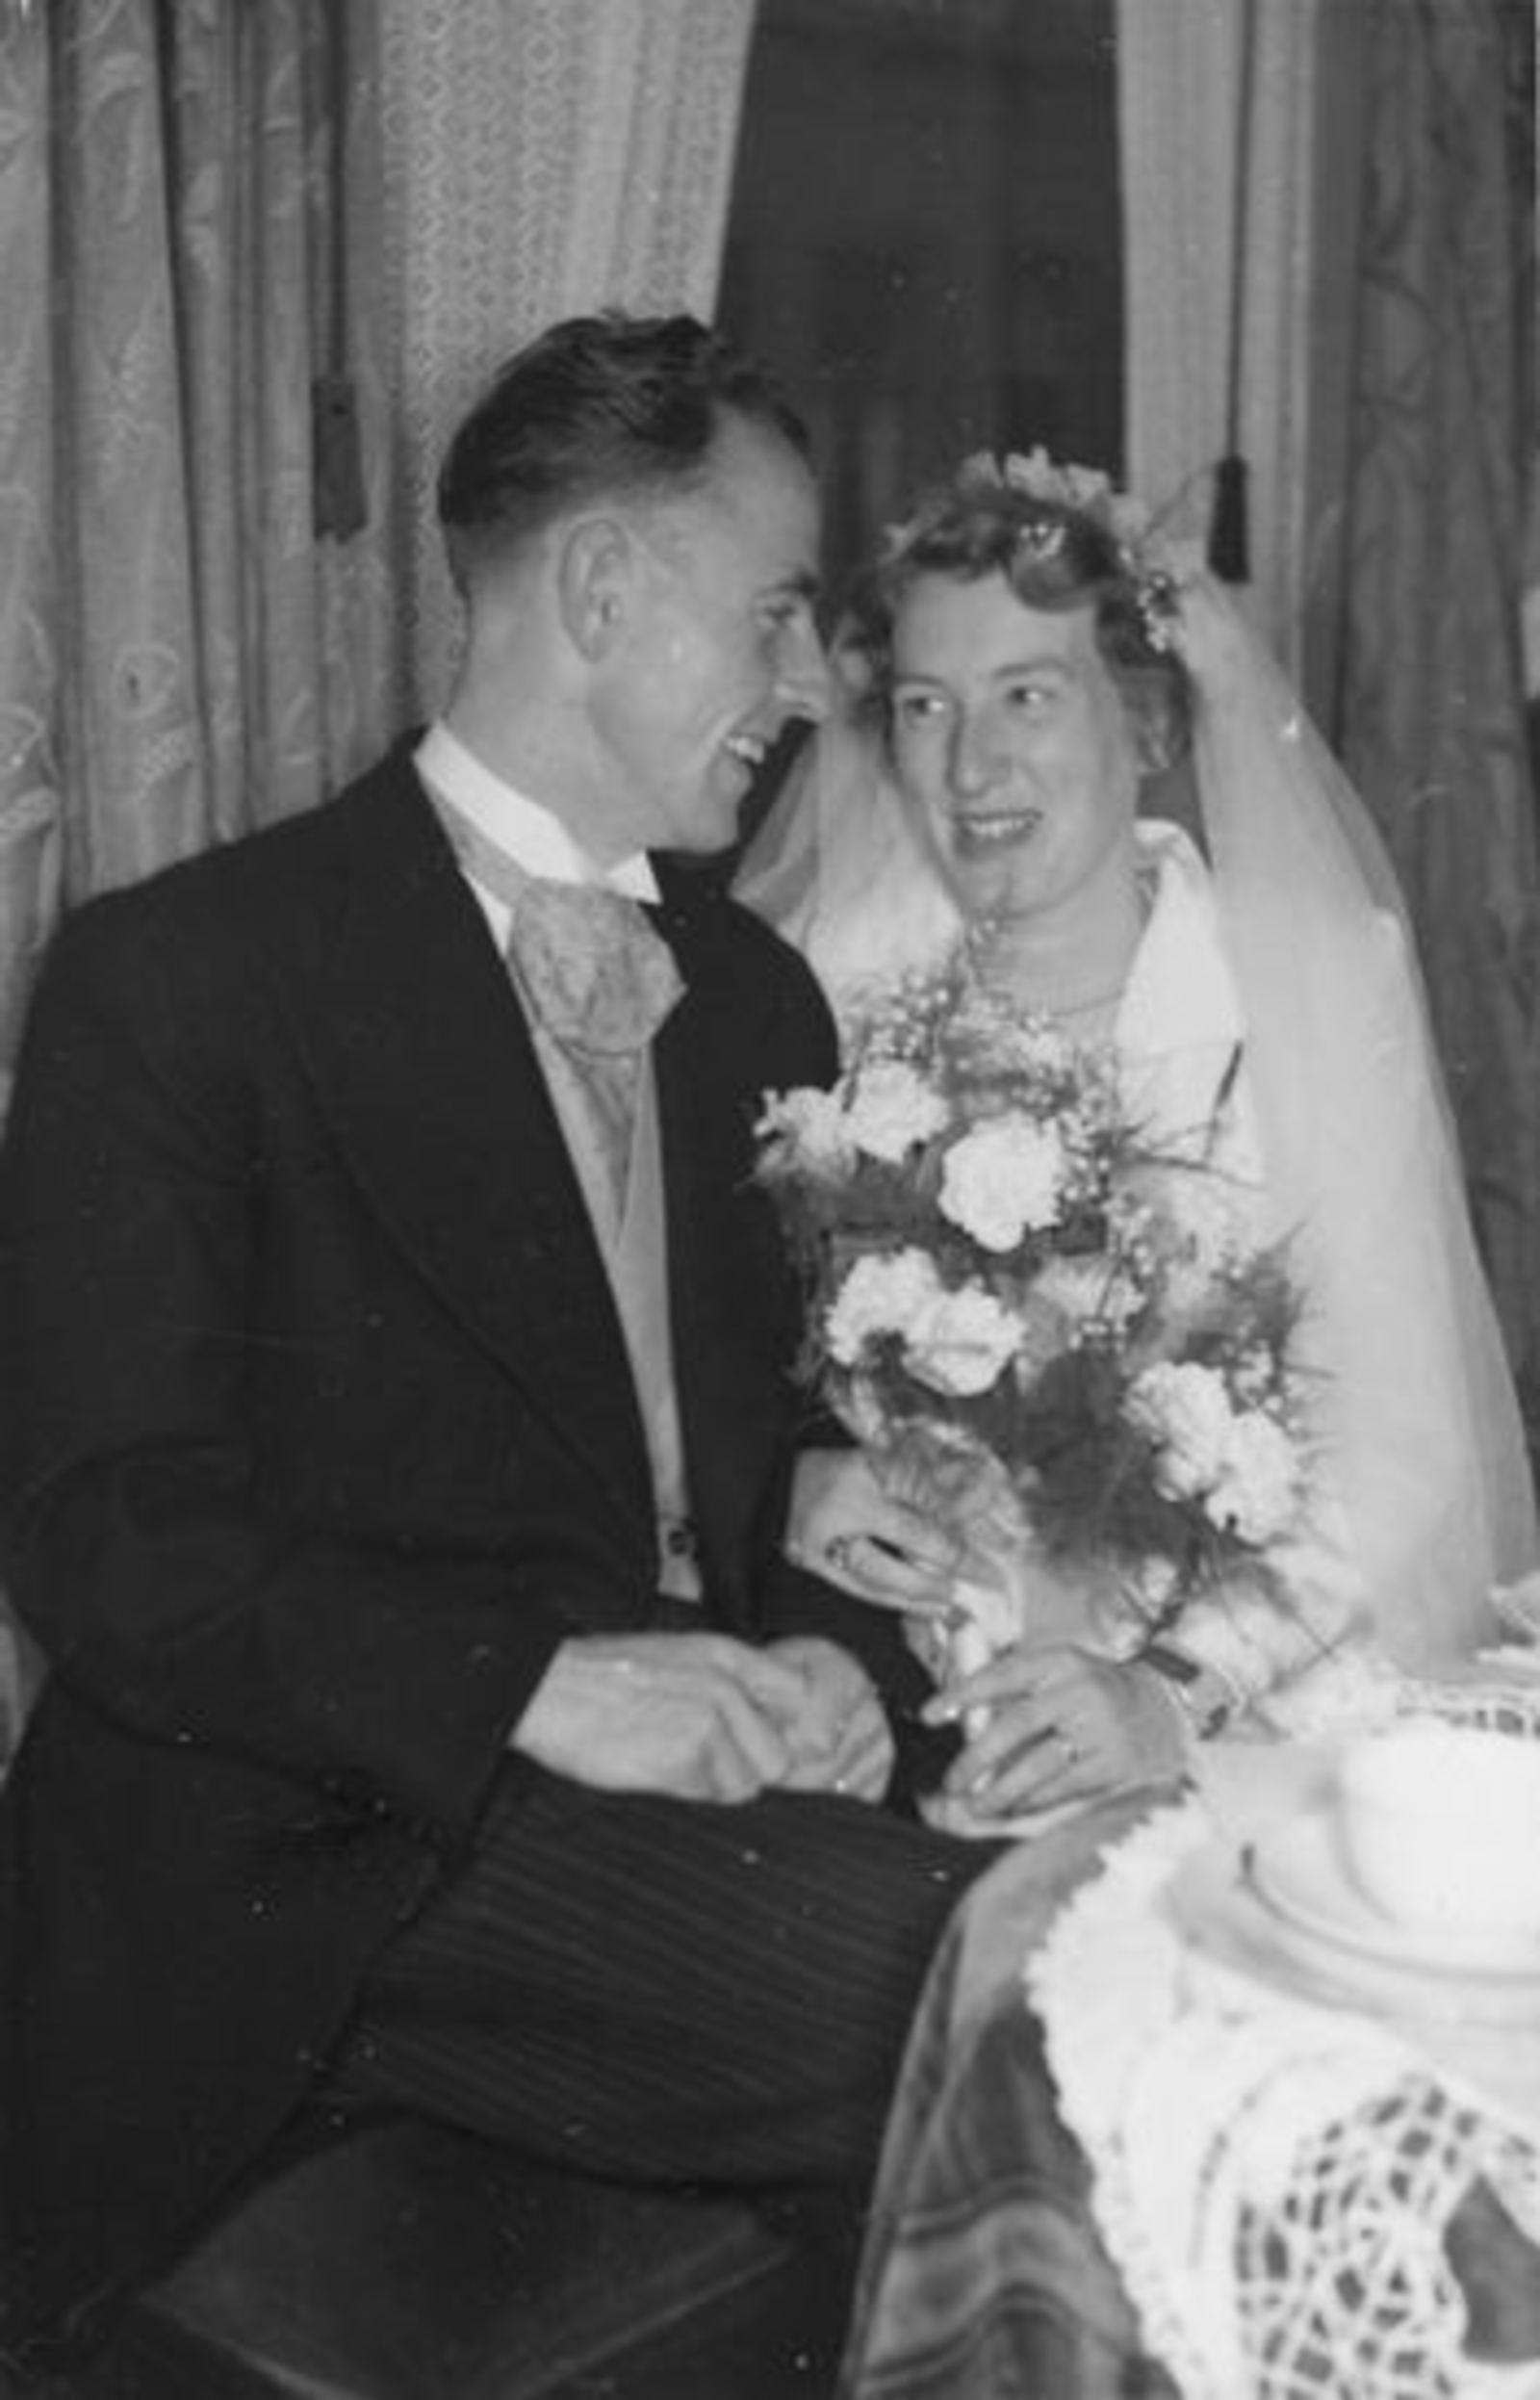 Broere Jaap 1925 19__ trouwt met Annie Koeman